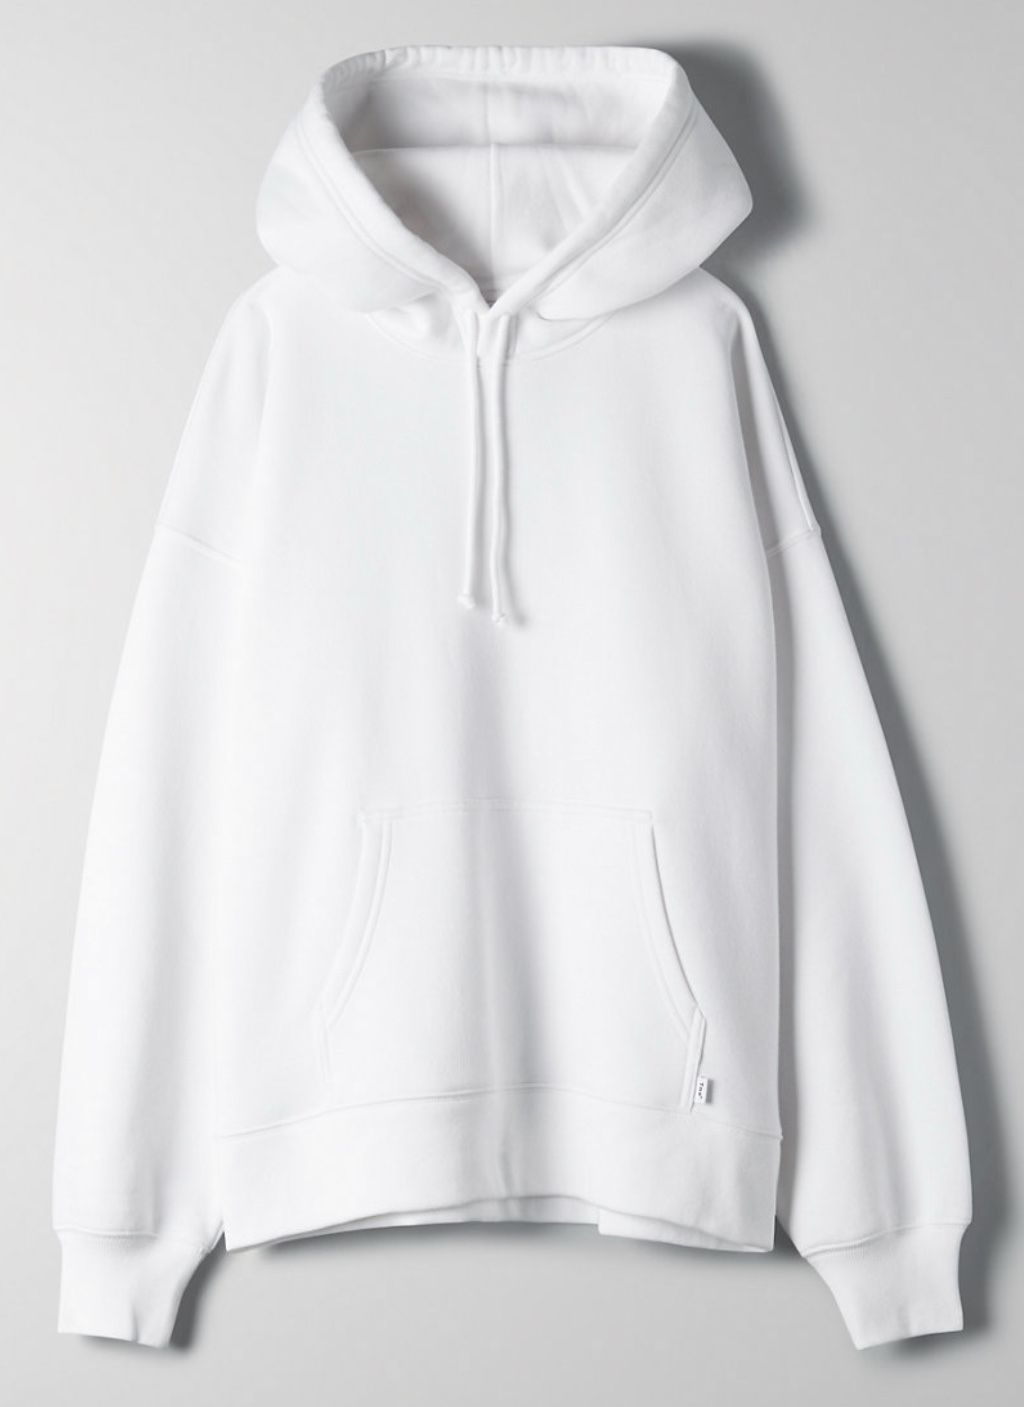 Cozyaf Boyfriend Hoodie Oversized White Hoodie White Hoodie Women White Hoodie [ 1407 x 1024 Pixel ]